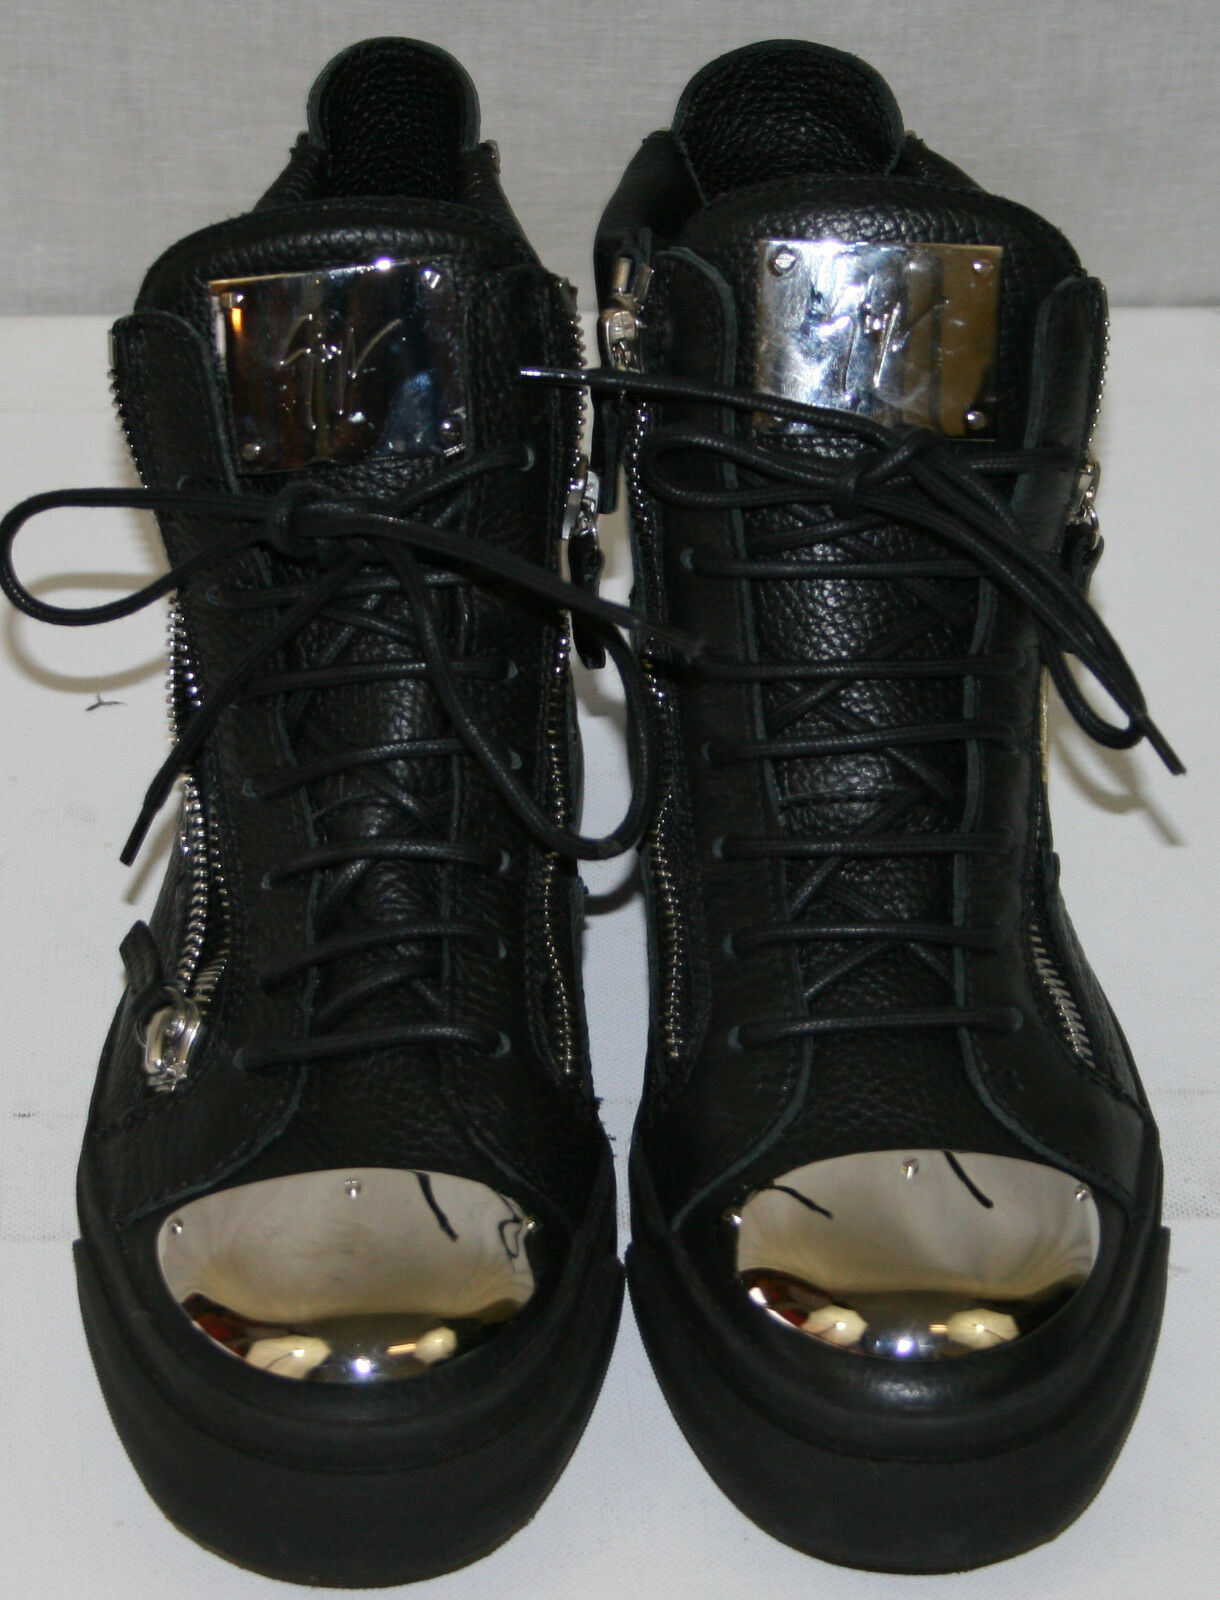 GIUSEPPE ZANOTTI DESIGN 'London' Metal Plate Leather Sneakers,Black 40 1635